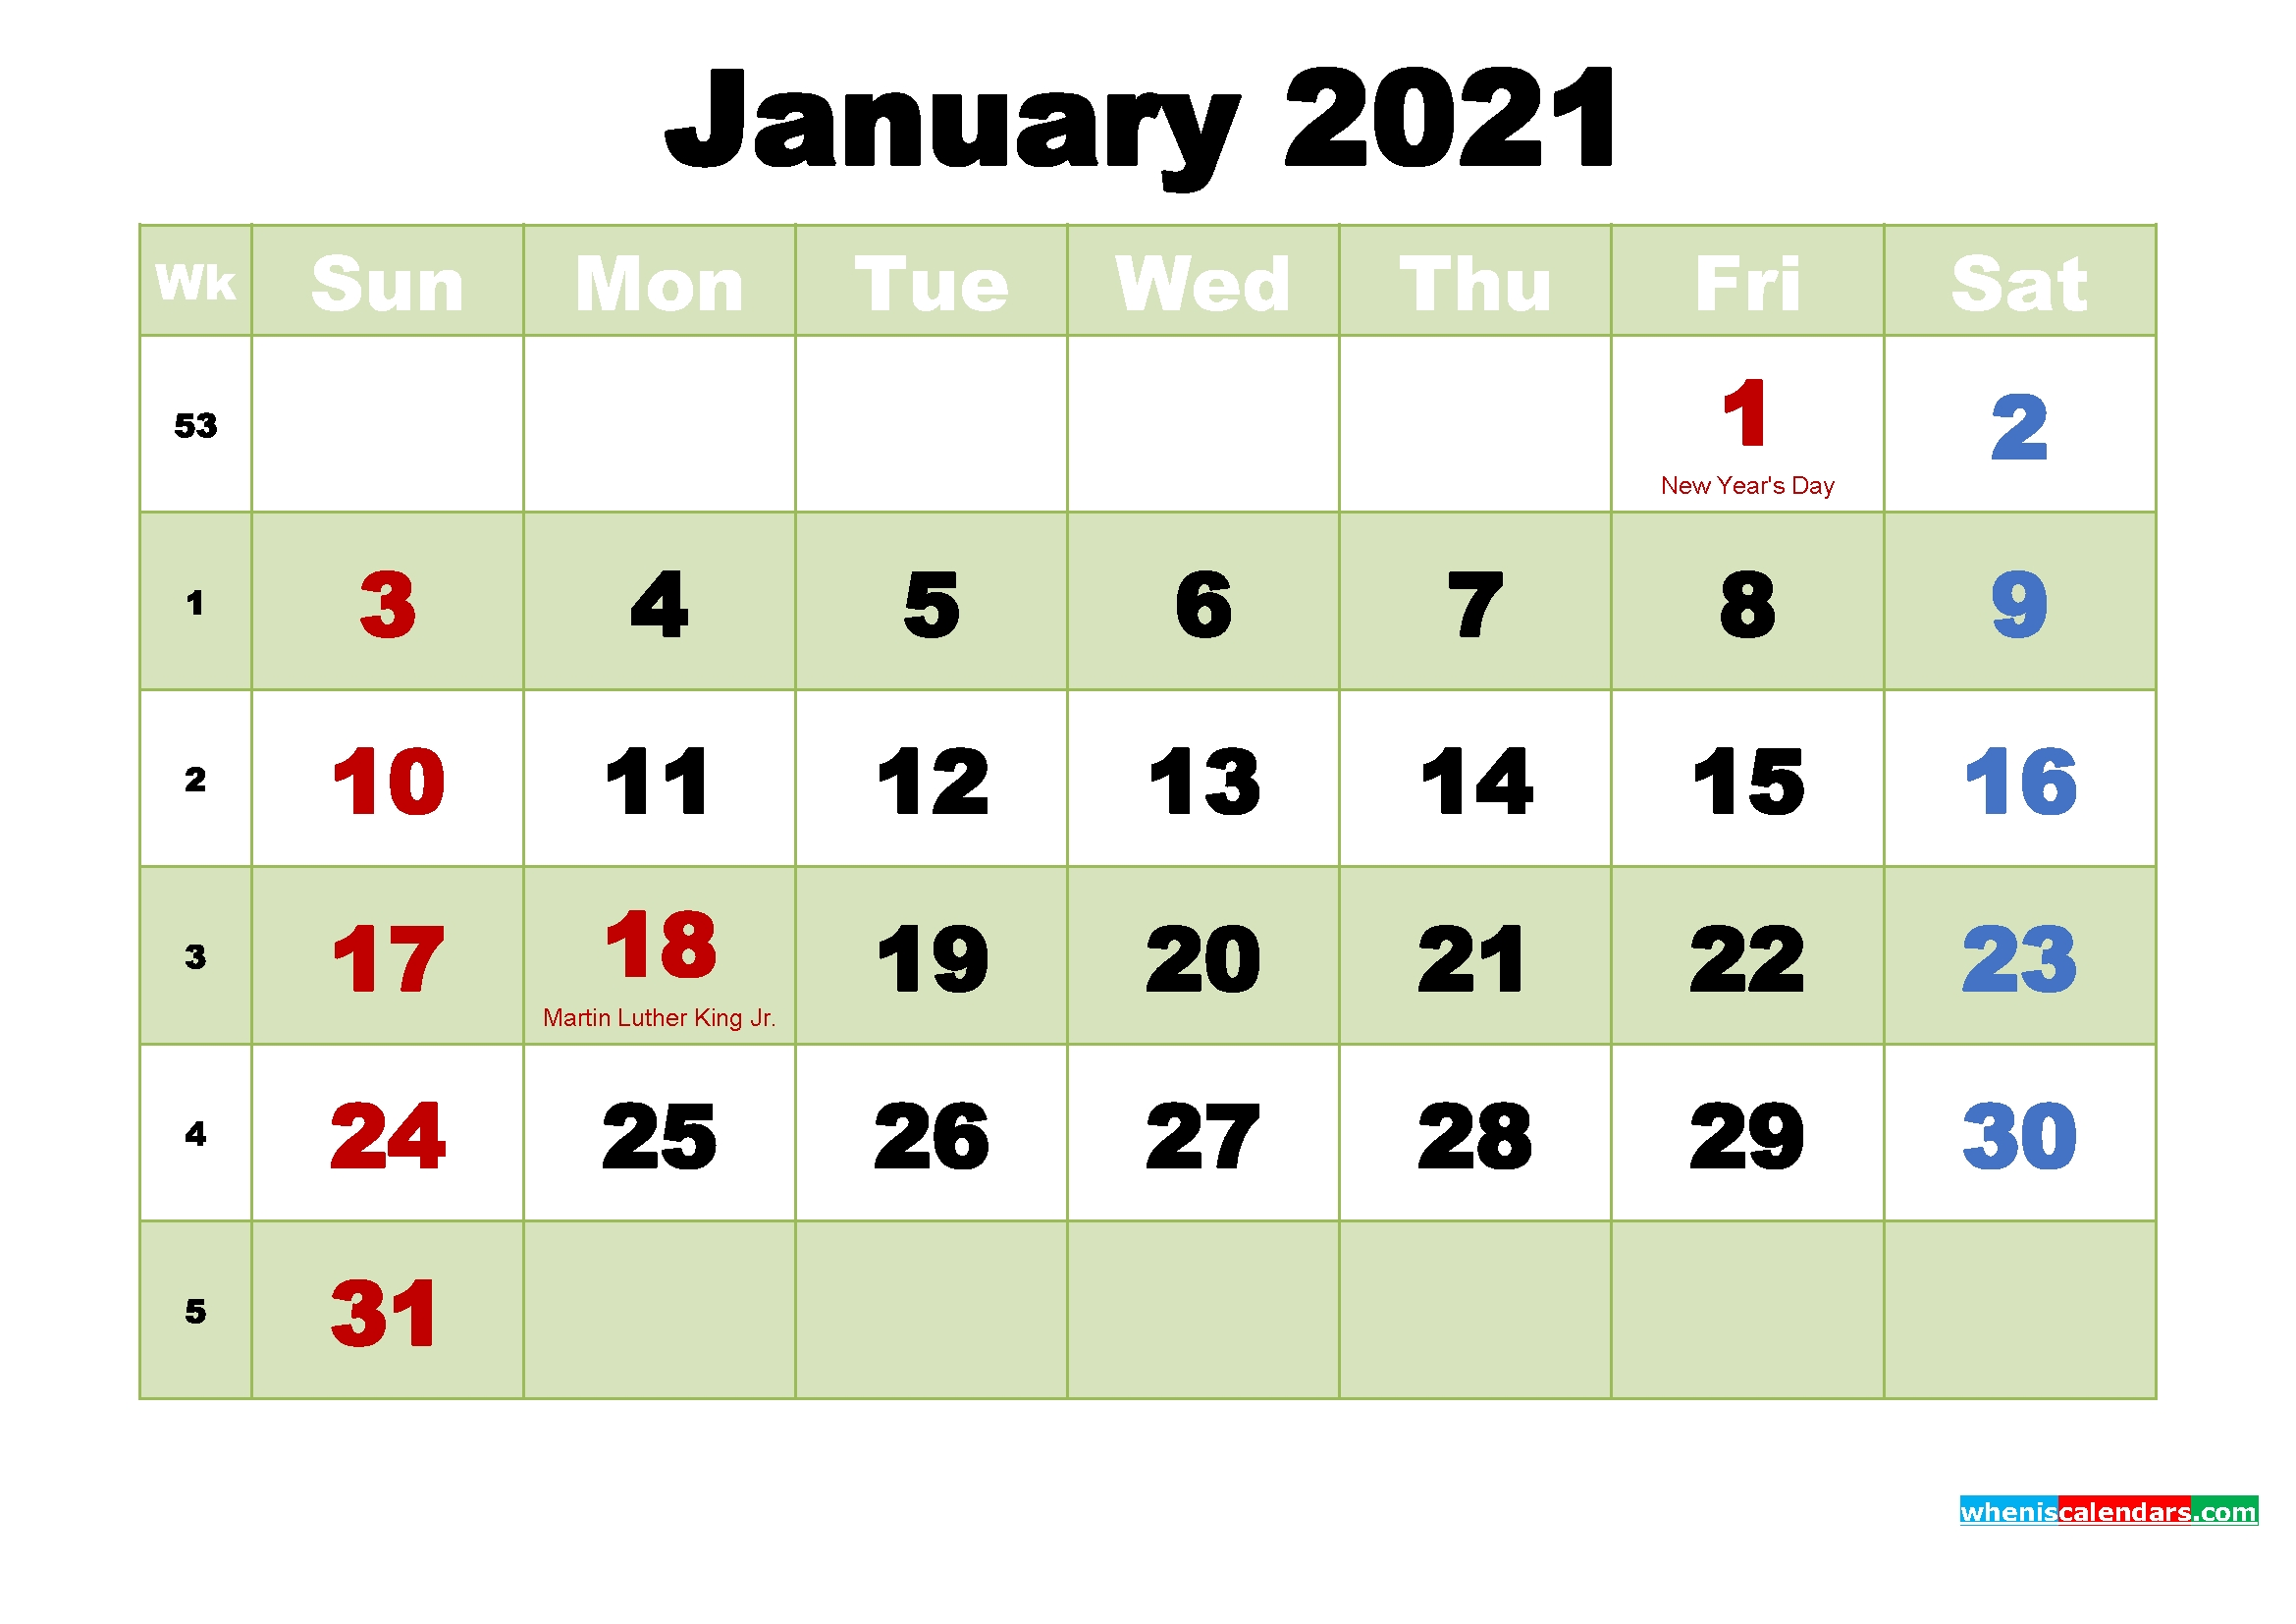 template kalender 2021 bts celoteh bijak